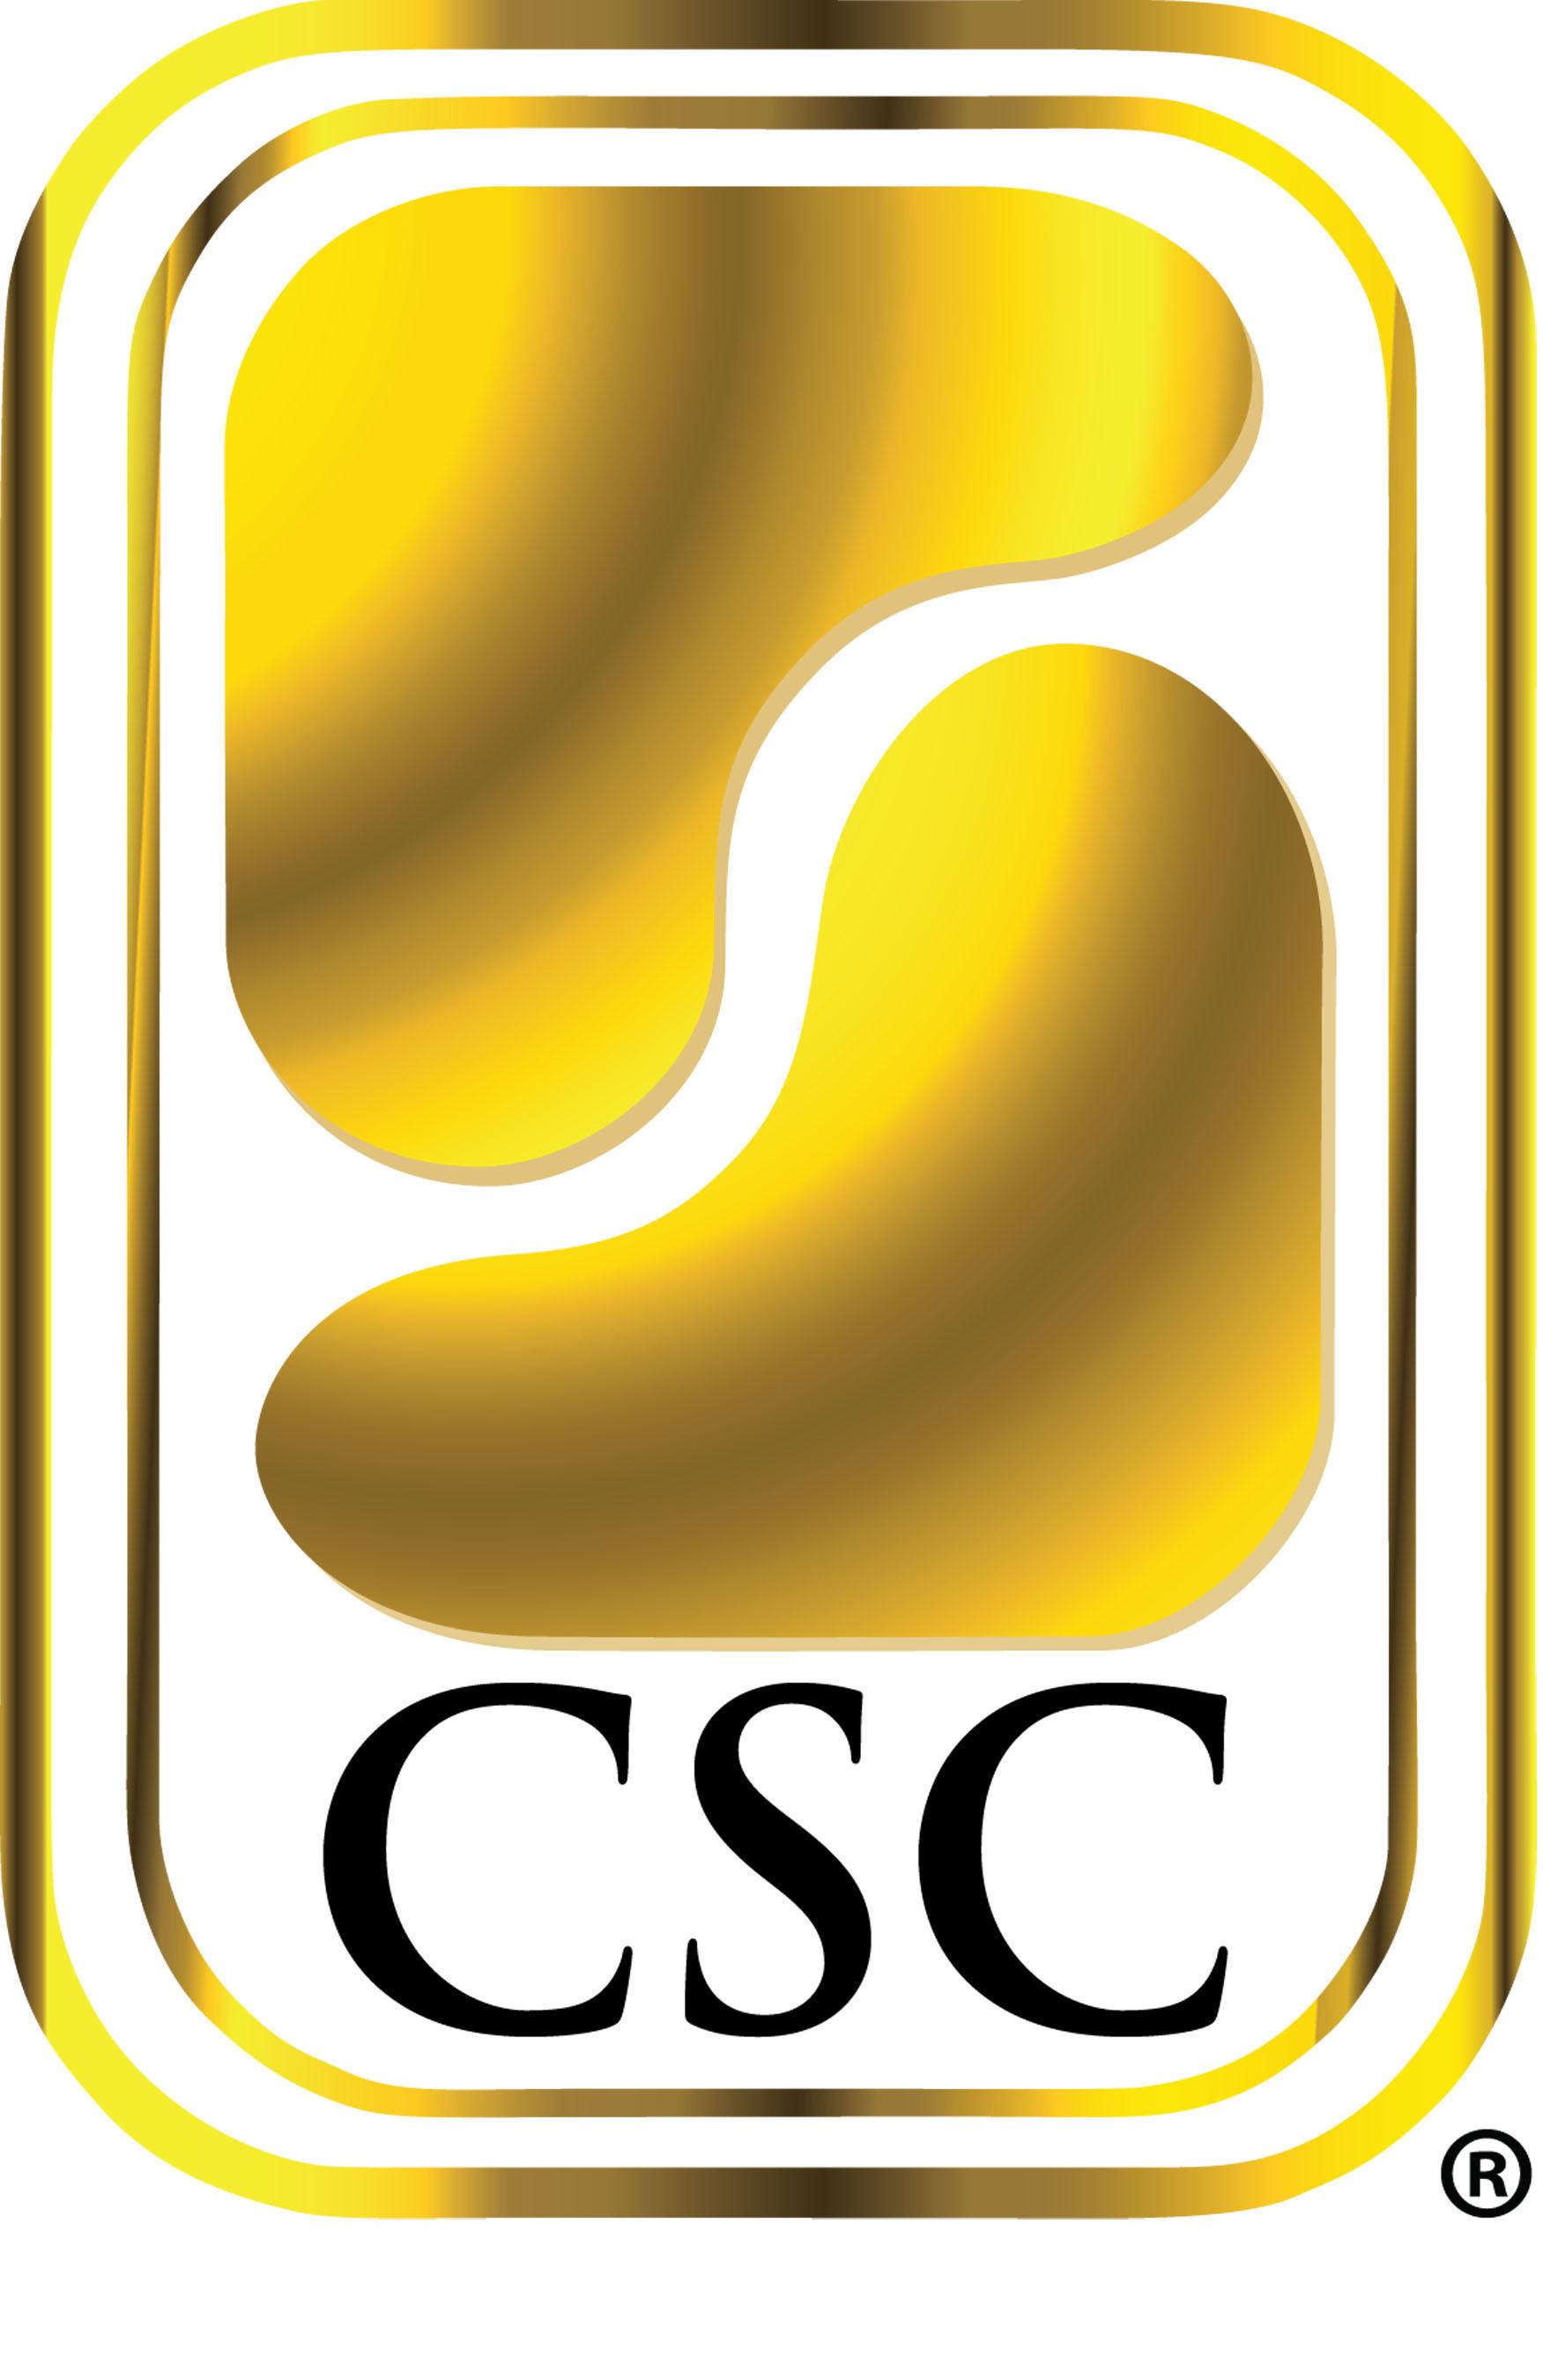 Contemporary Services Corporation.